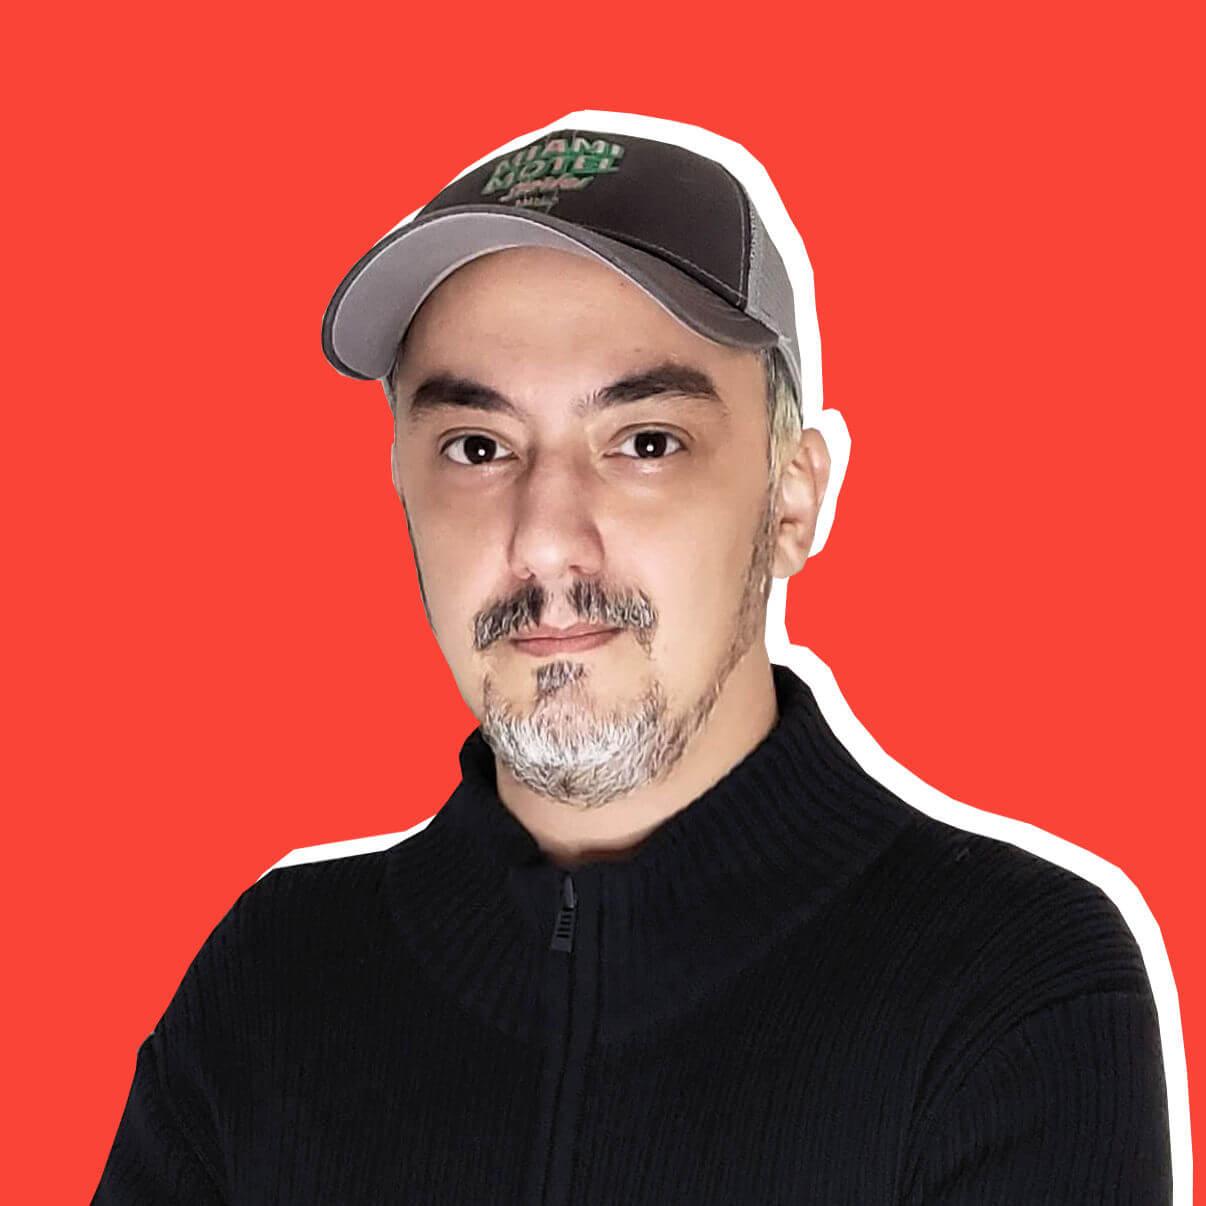 Daniel Gangi